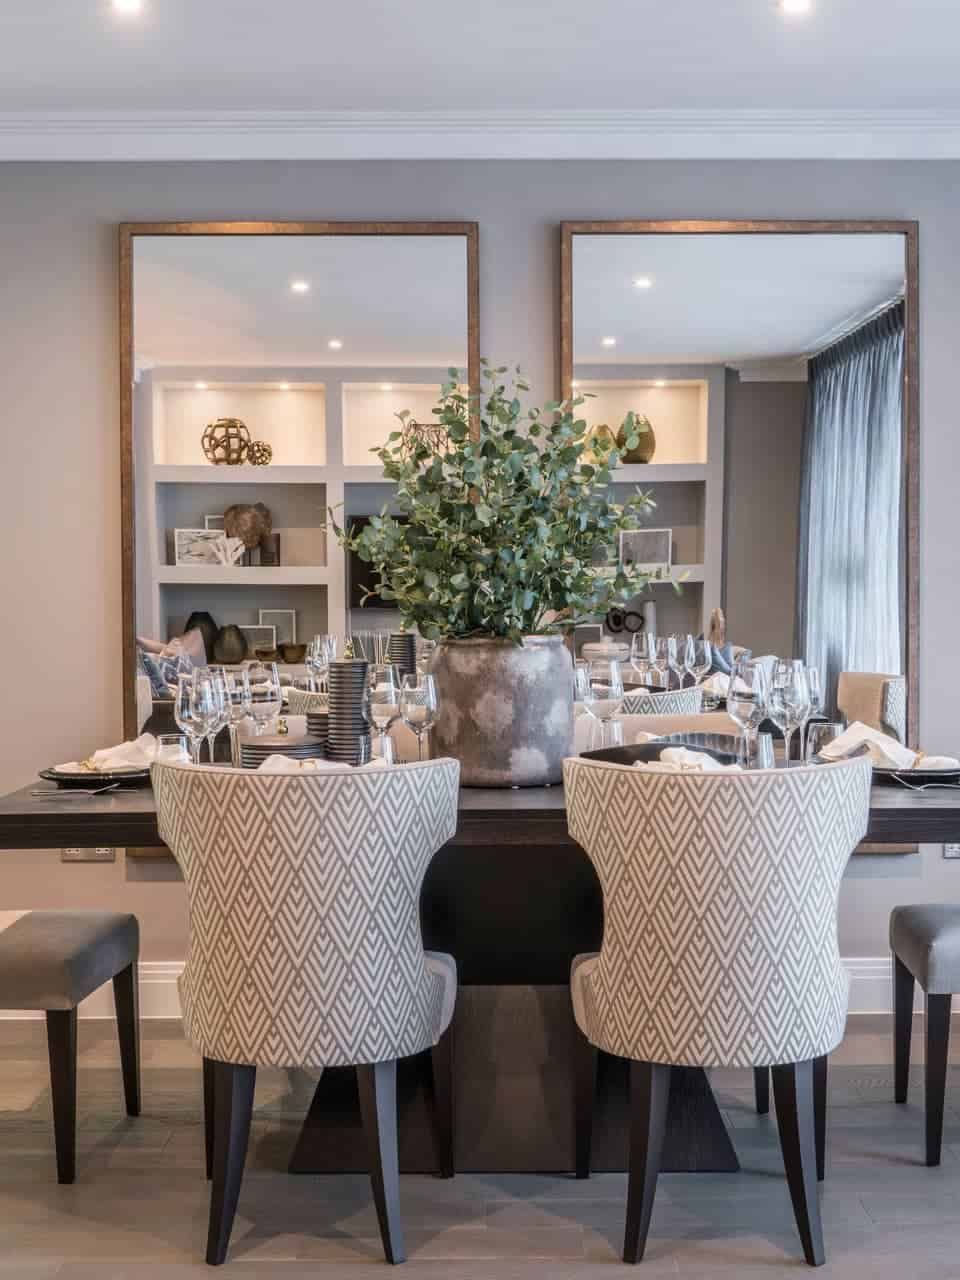 Dining Room Mirror Decor, Dining Room Table Ideas Uk